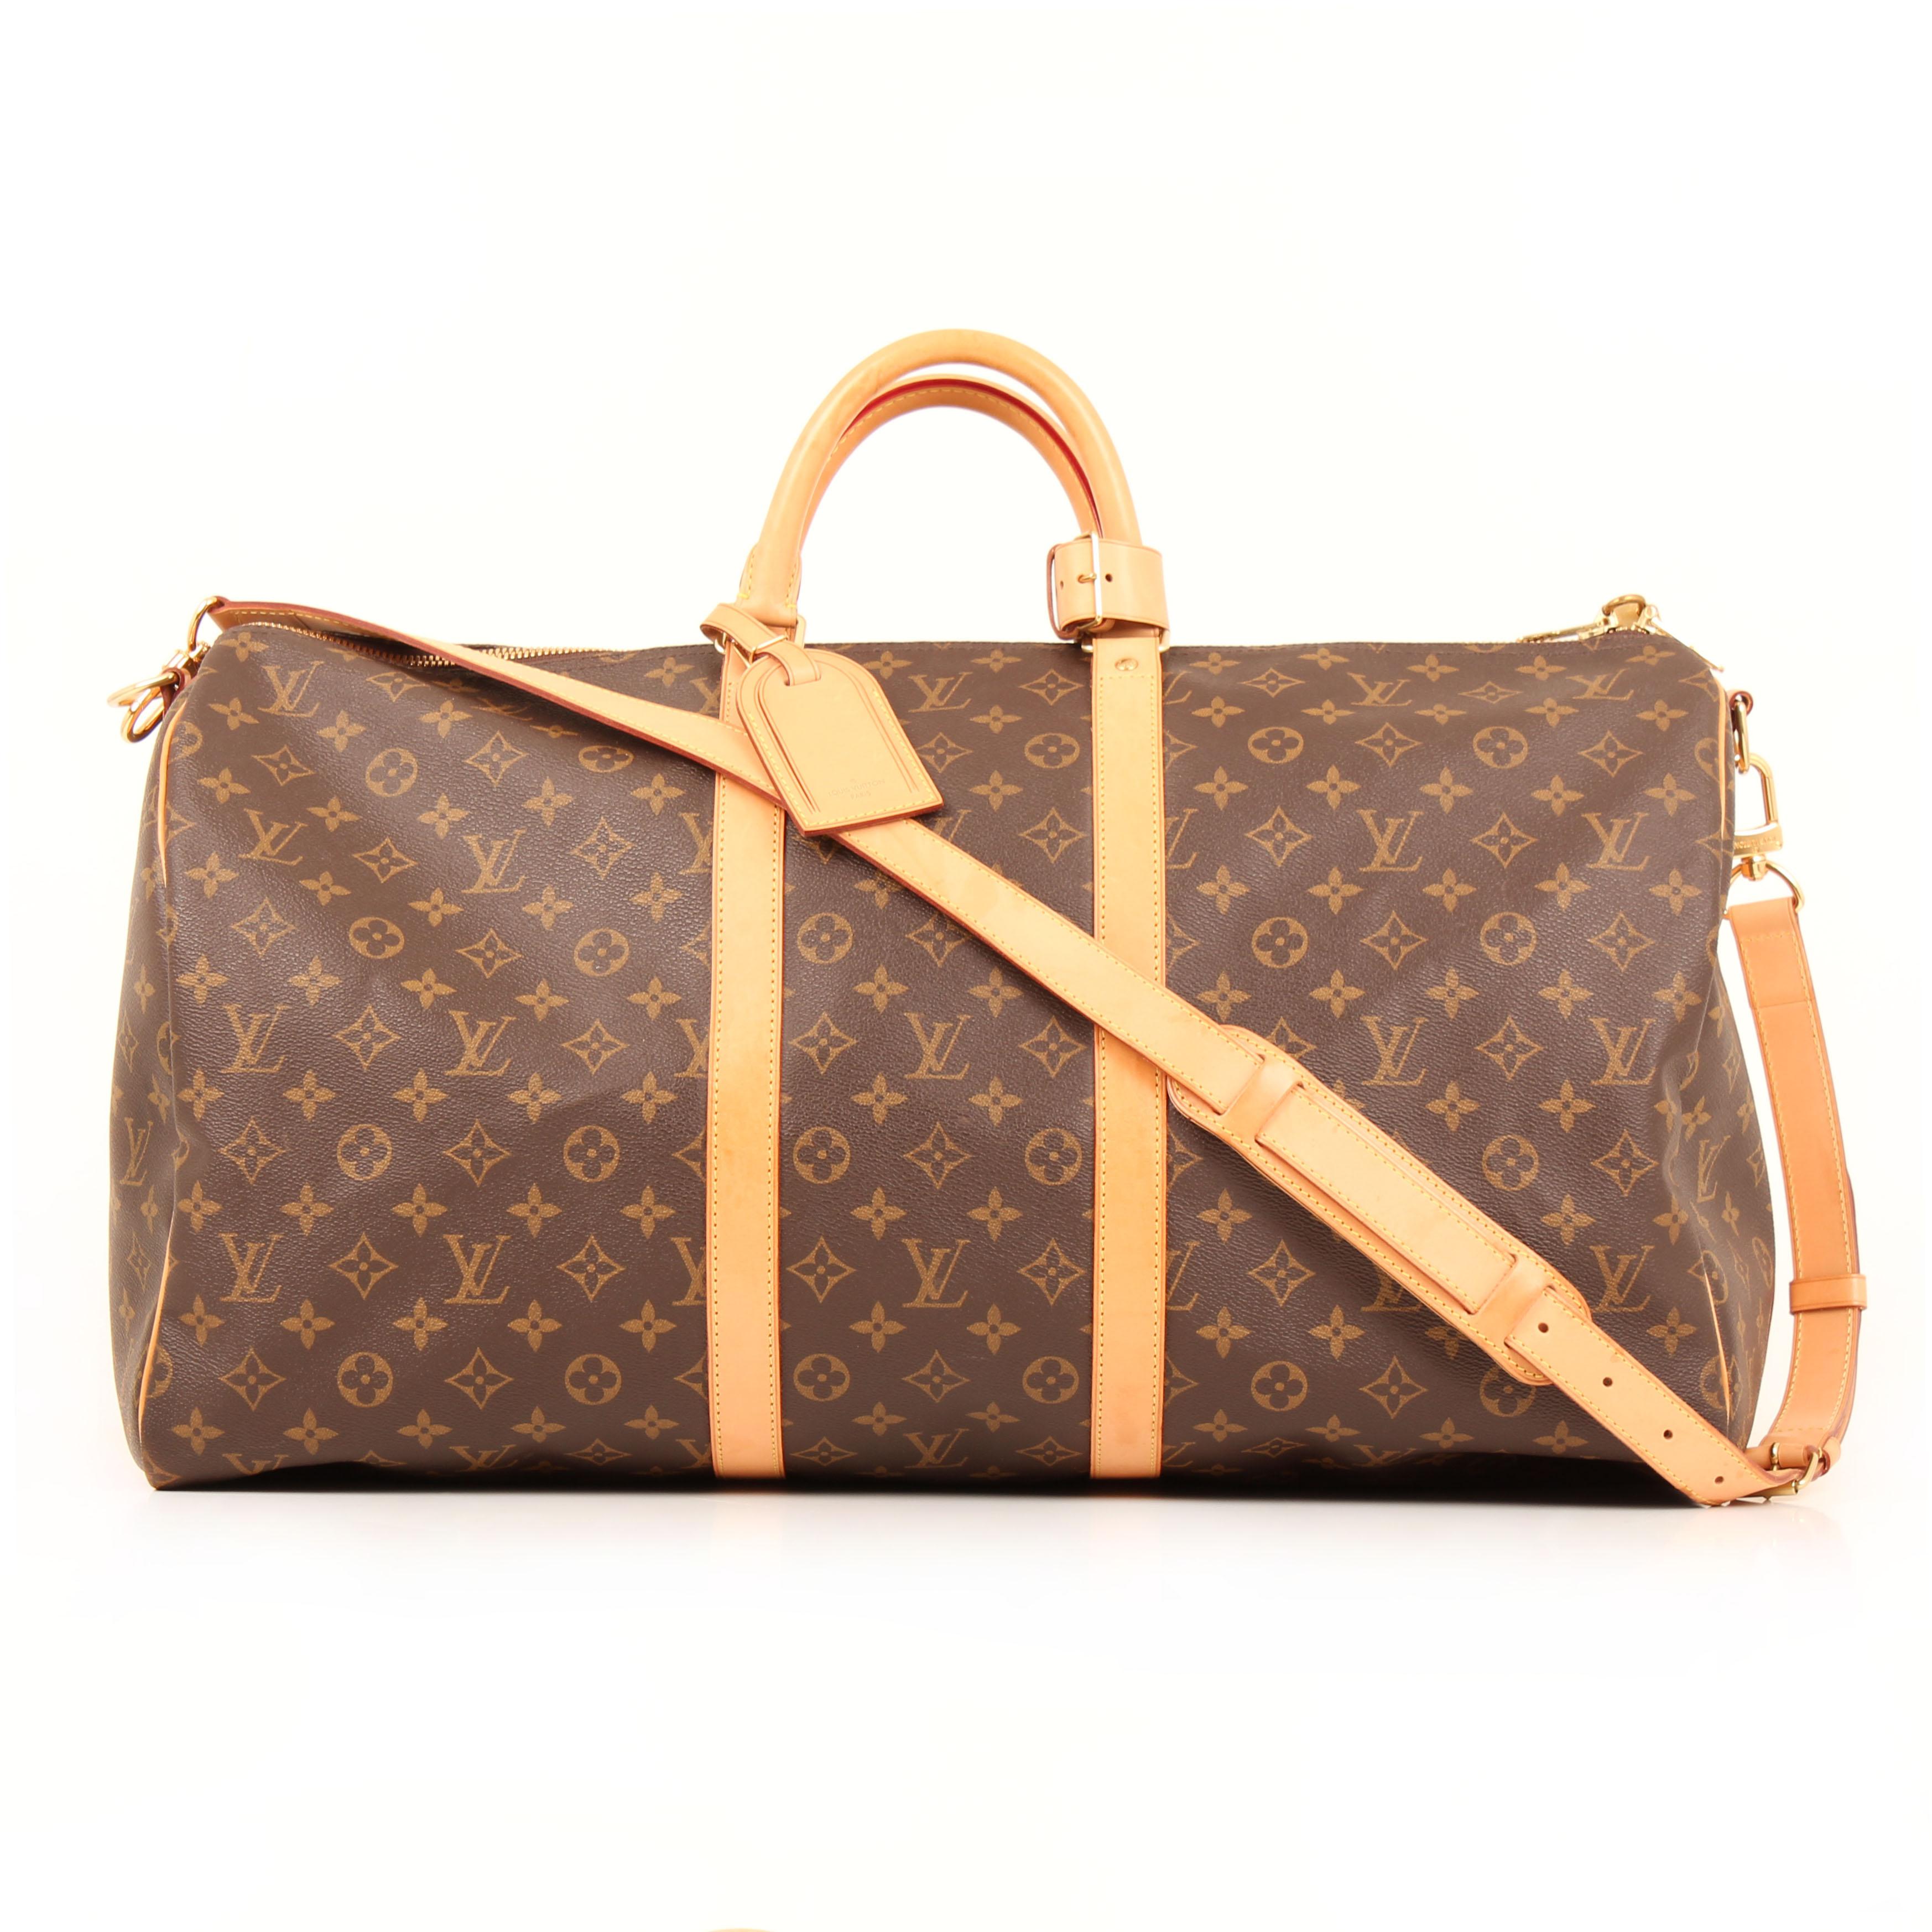 louis vuitton travel bag keepall 55 monogram front strap